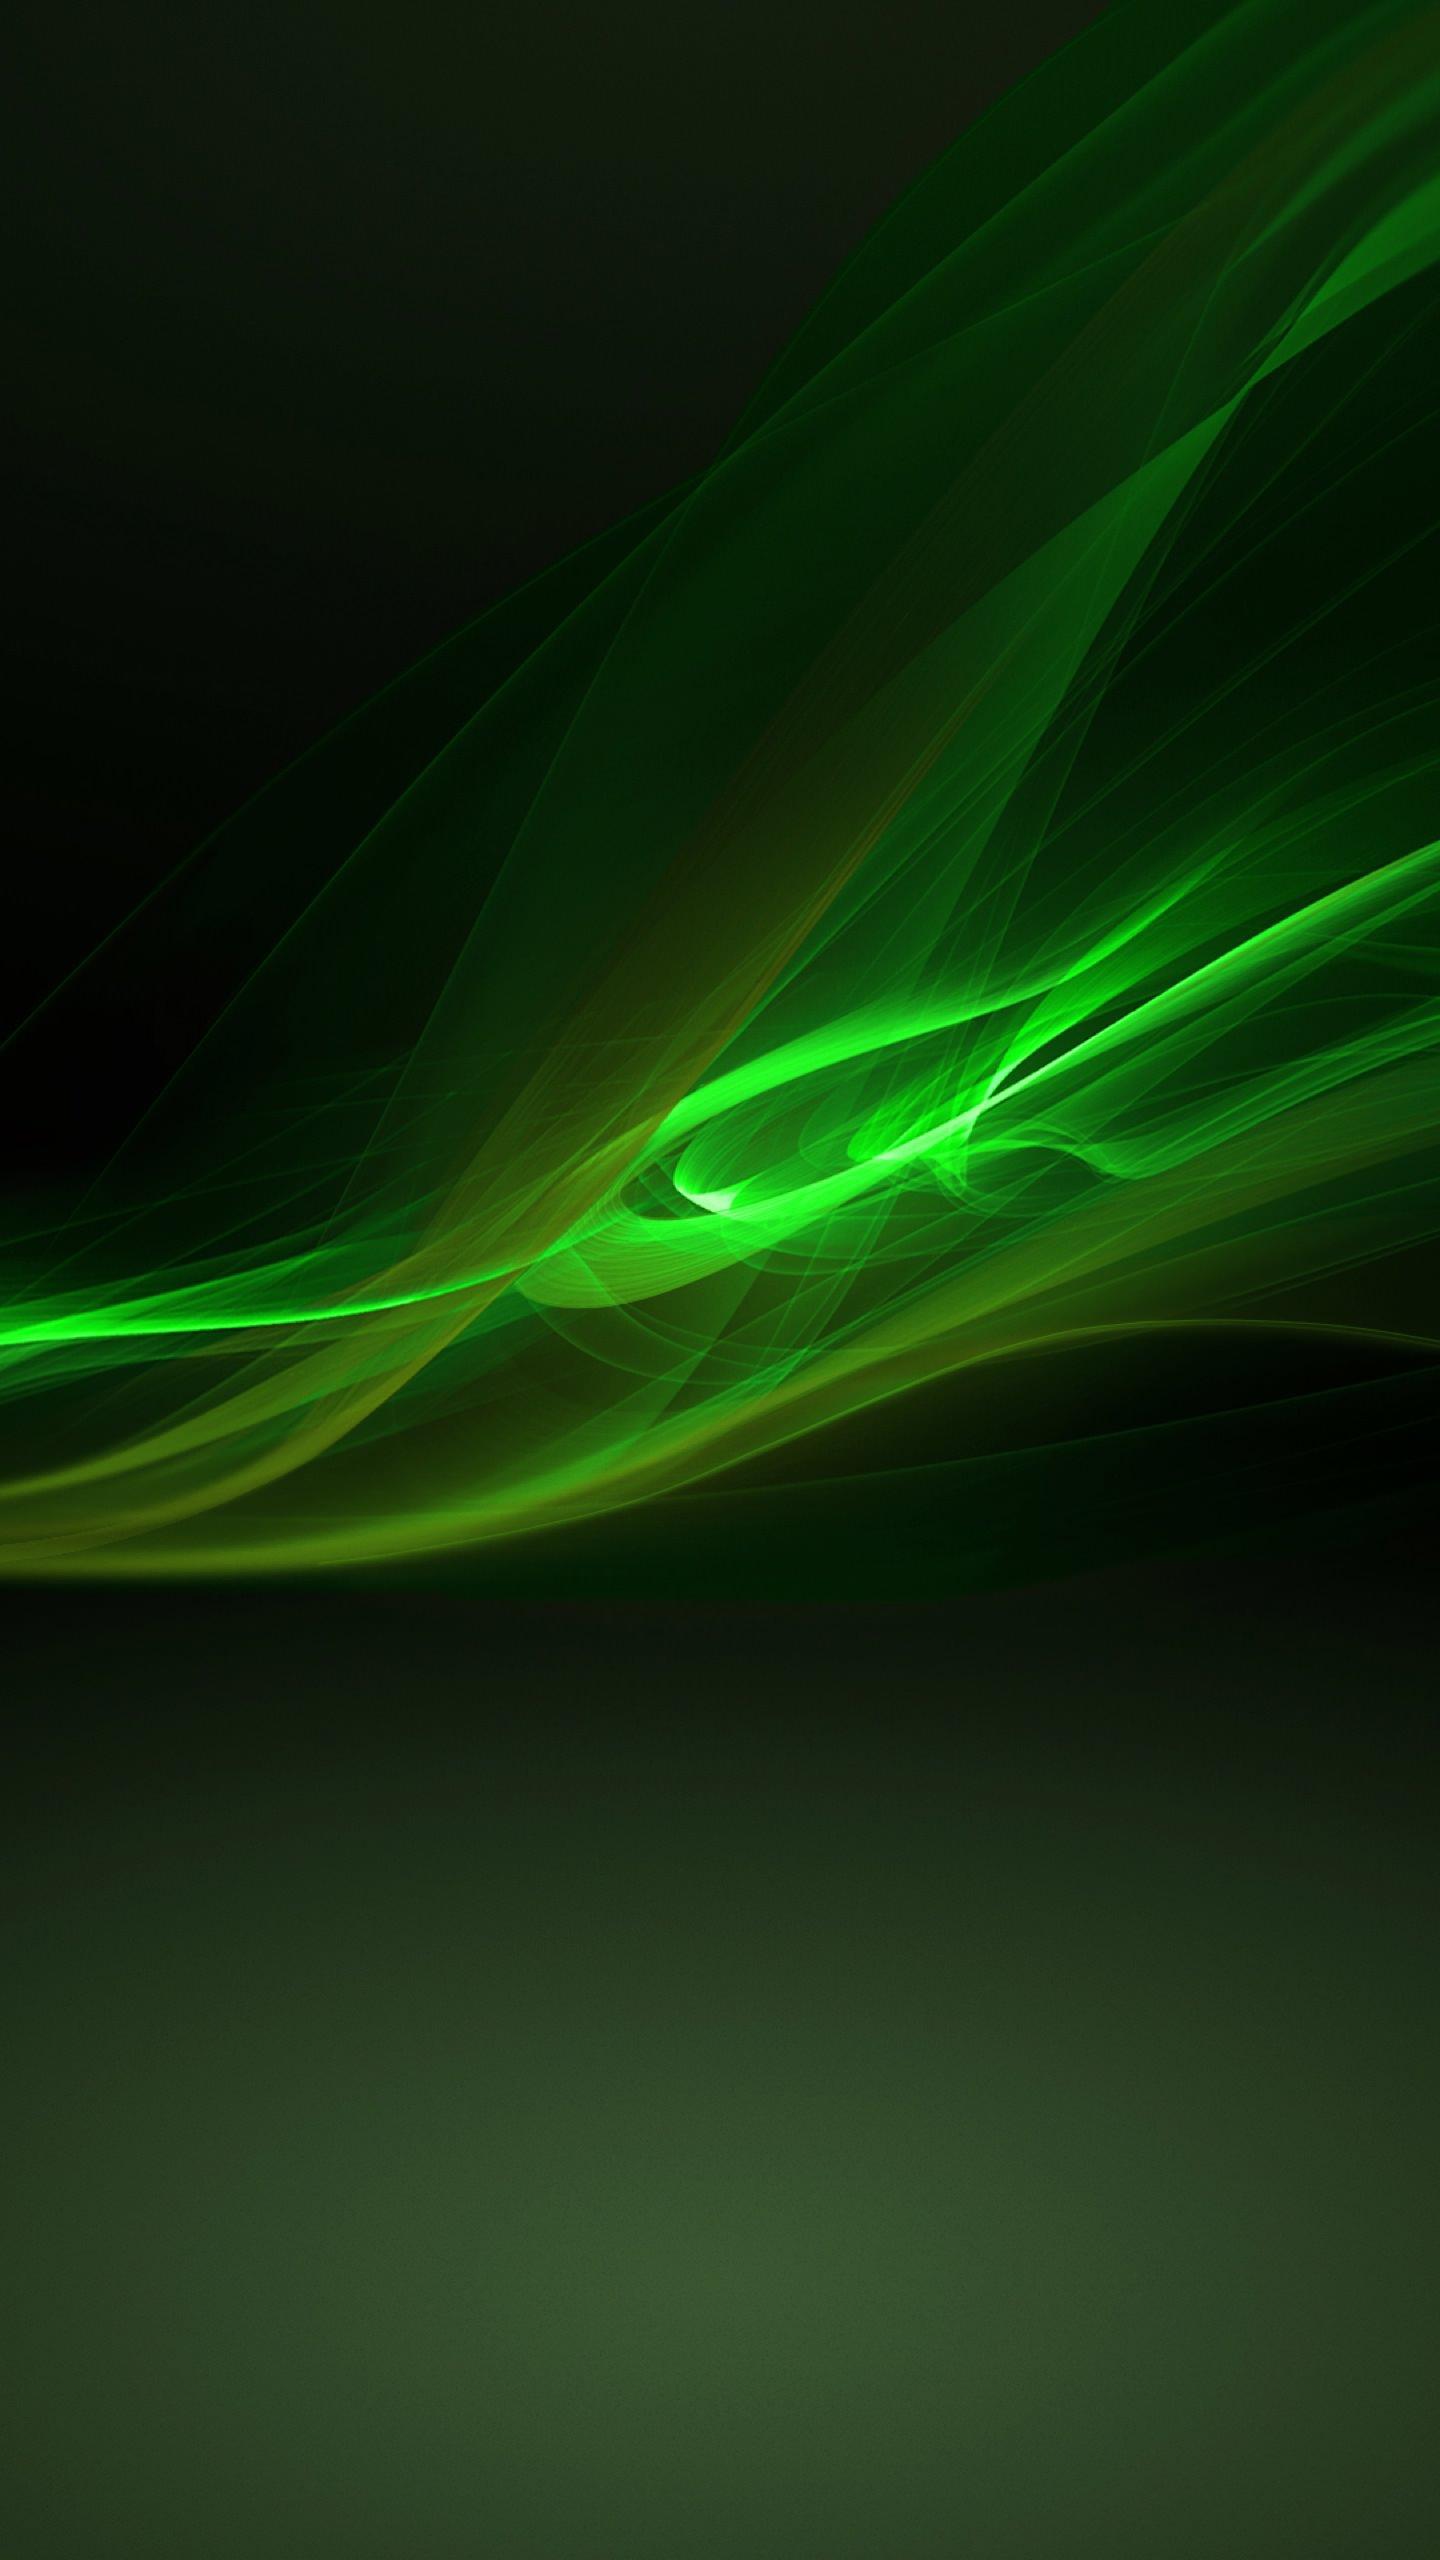 Green Cool wallpapersc SmartPhone 1440x2560